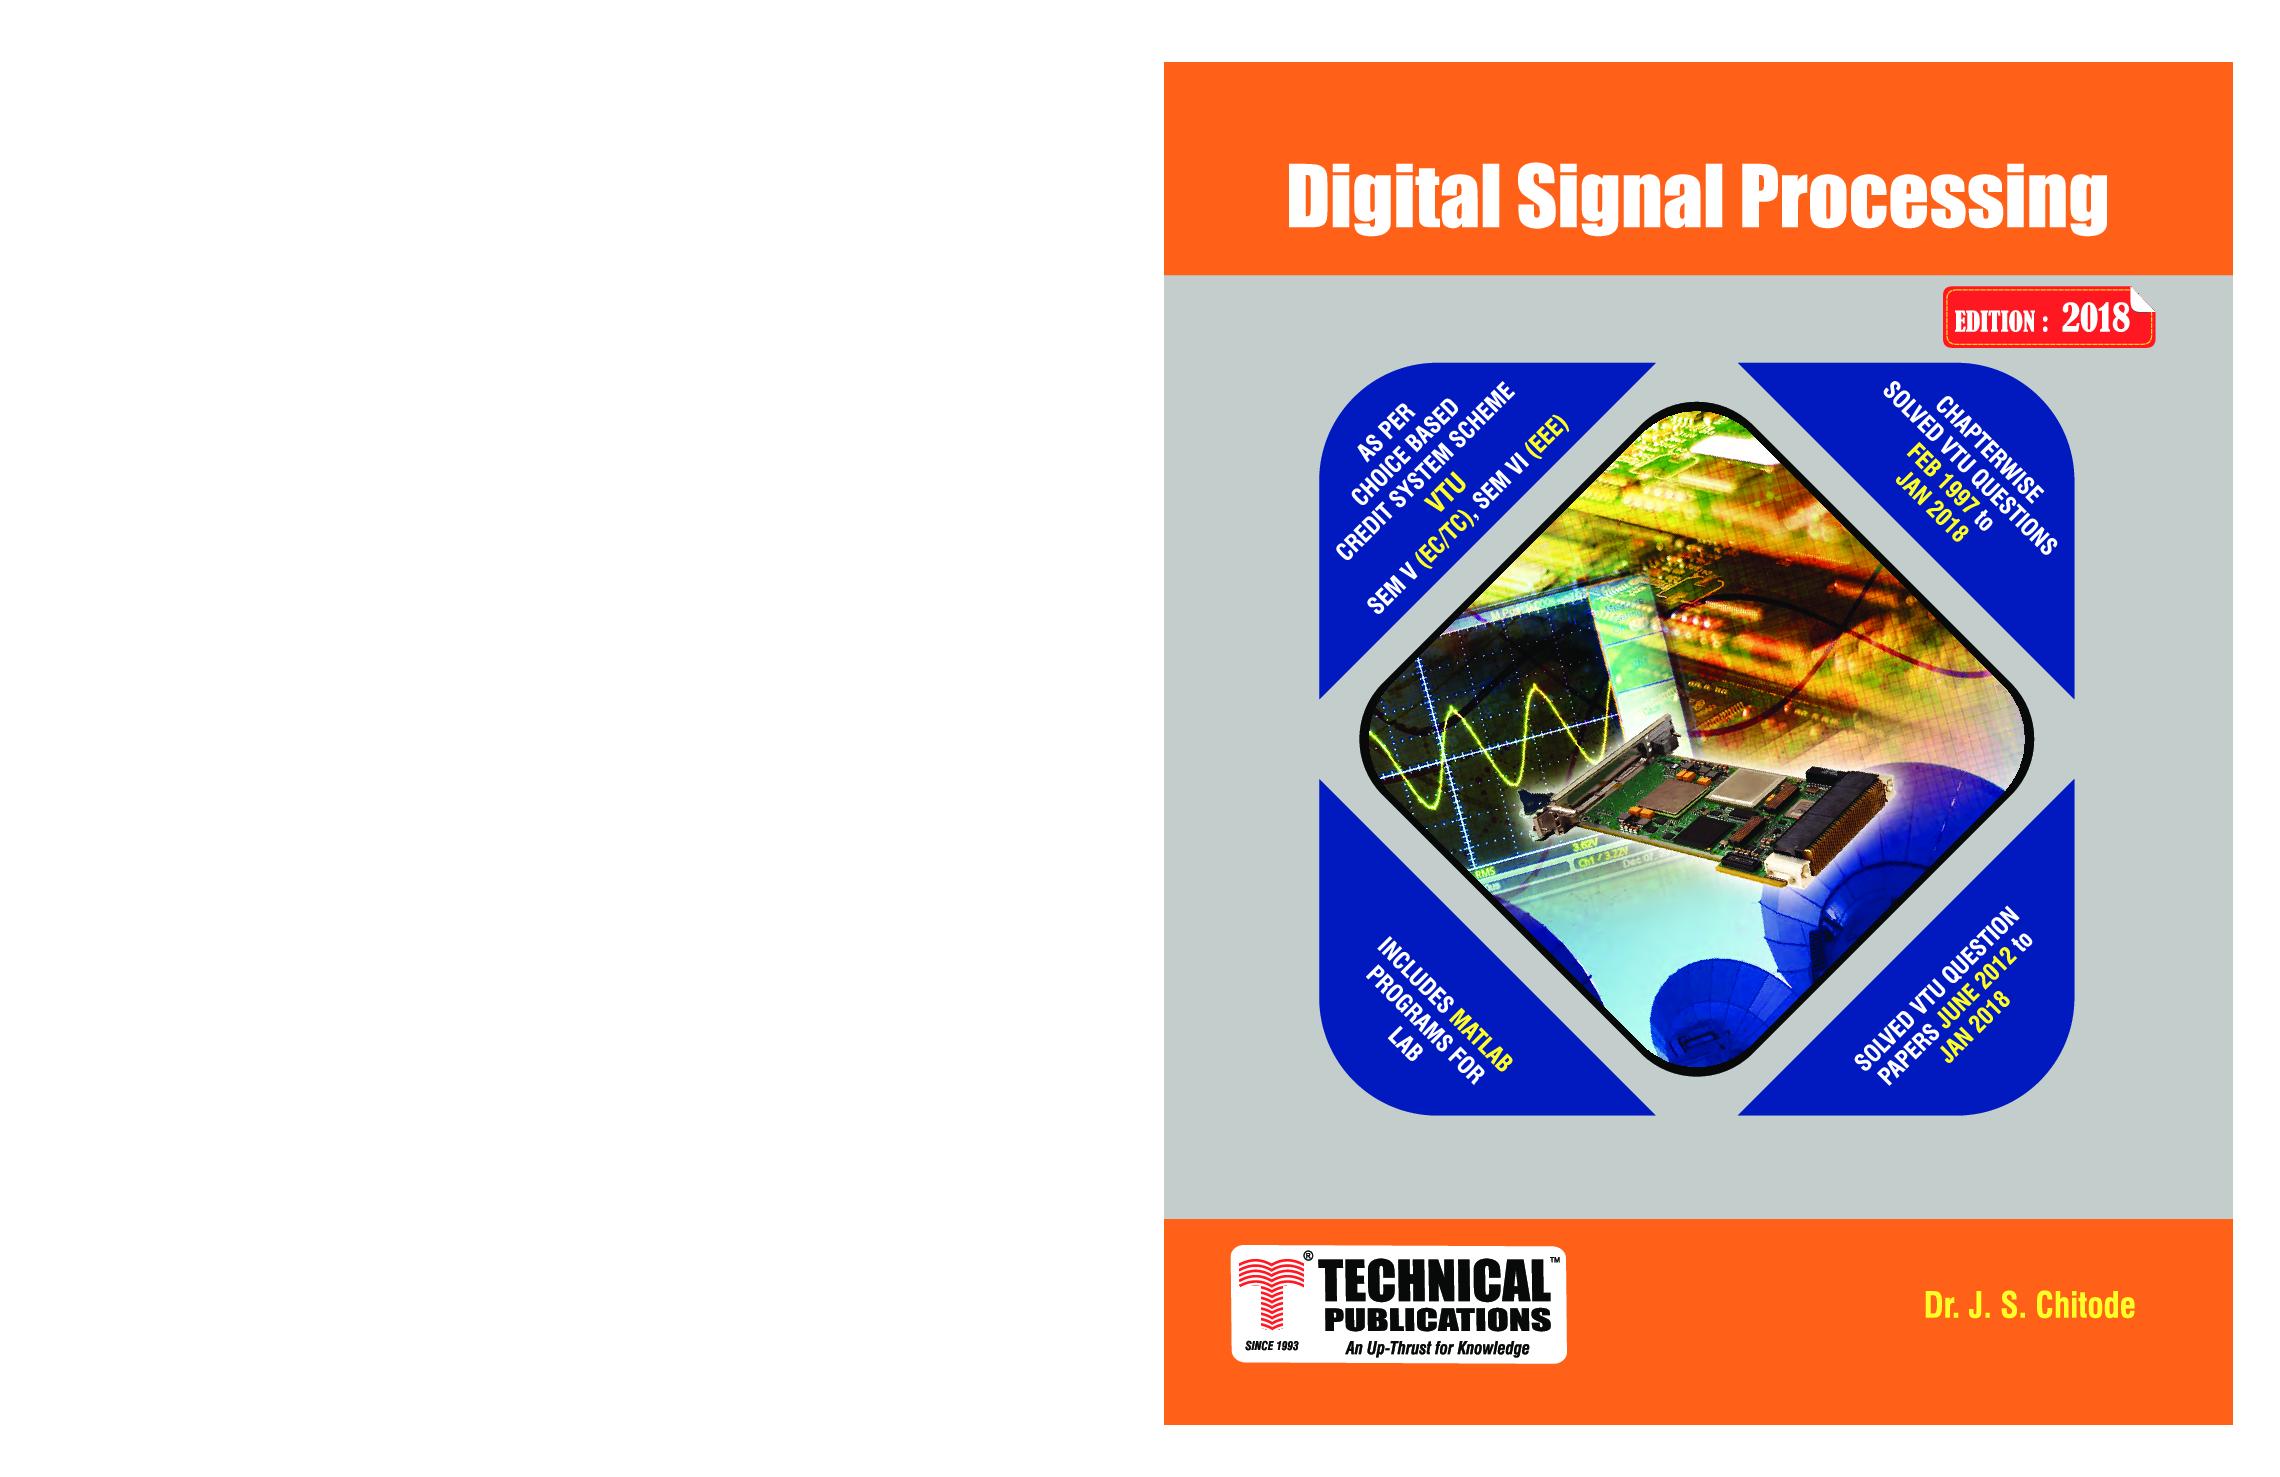 Digital Signal Processing For VTU - Page 1